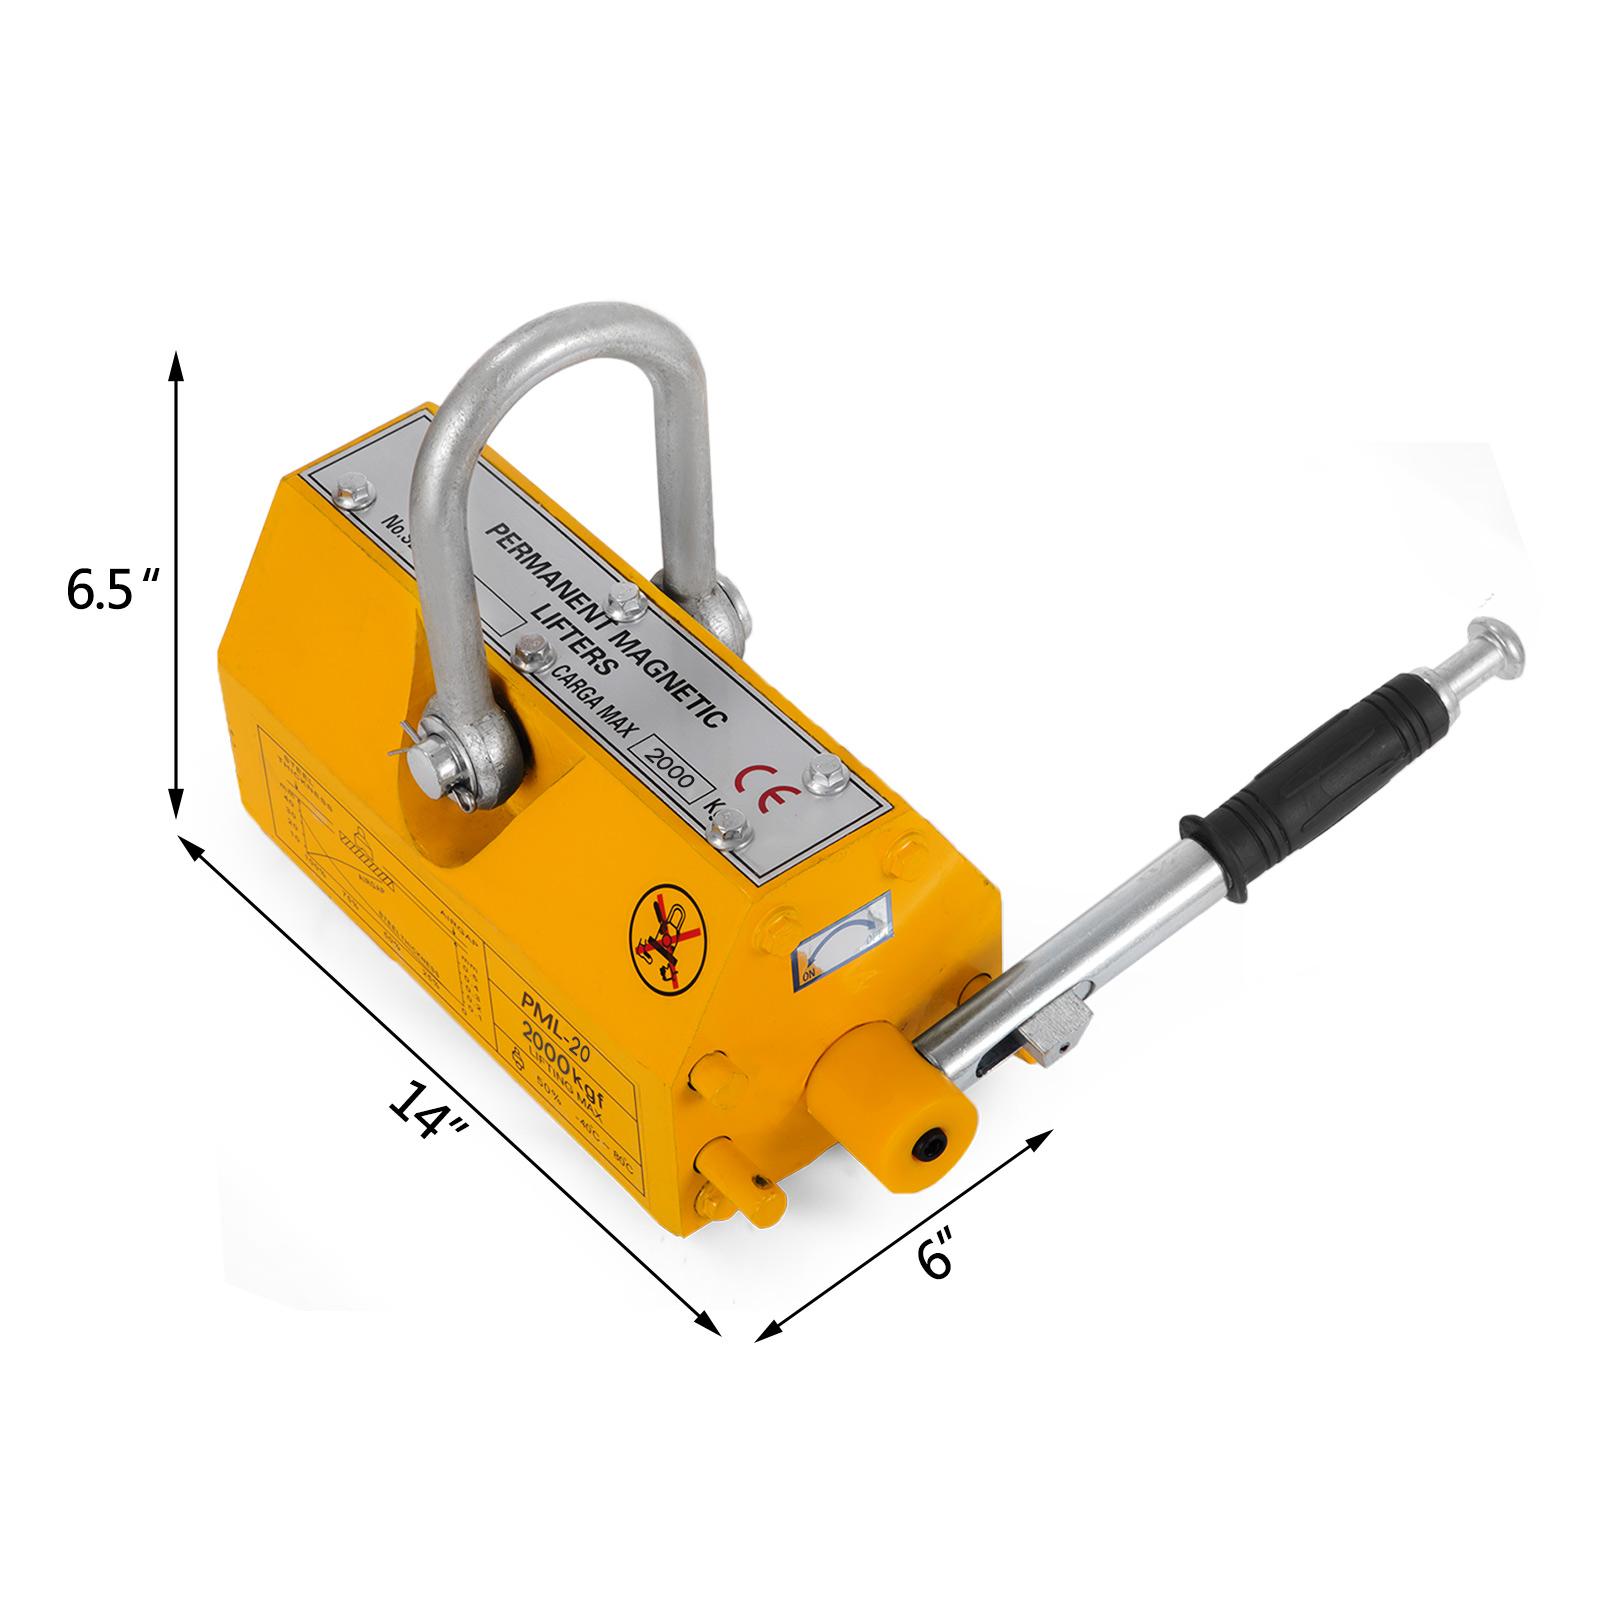 100-300-600-1000KG-Steel-Magnetic-Lifter-Heavy-Duty-Crane-Hoist-Lifting-Magnet miniature 86